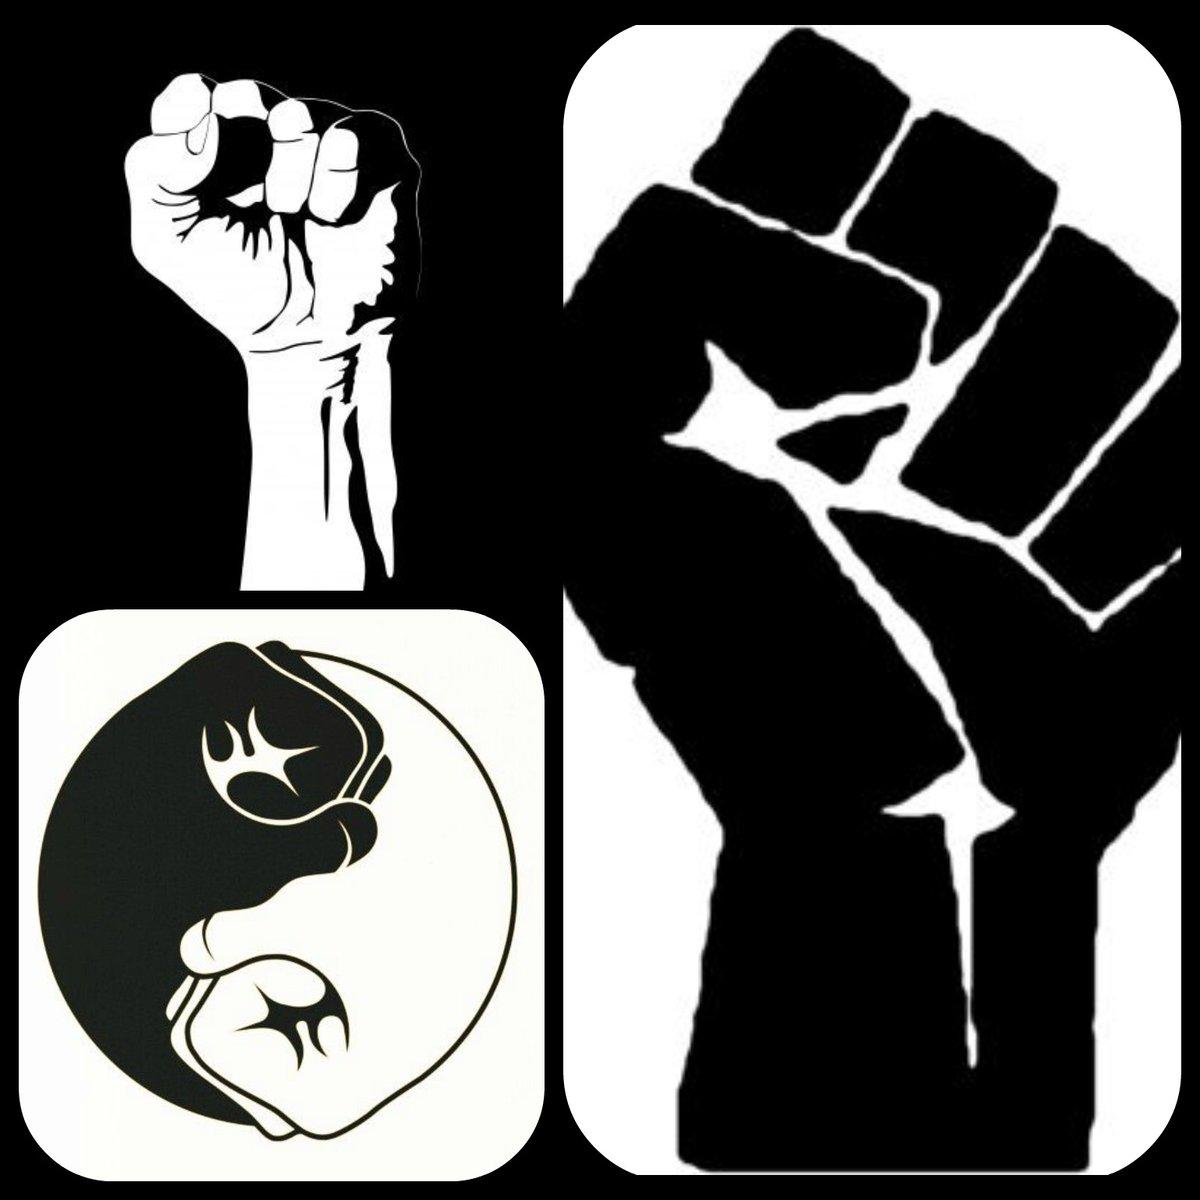 @ymonge @UnitatvsRacisme https://t.co/eS9Jhtp1ZL